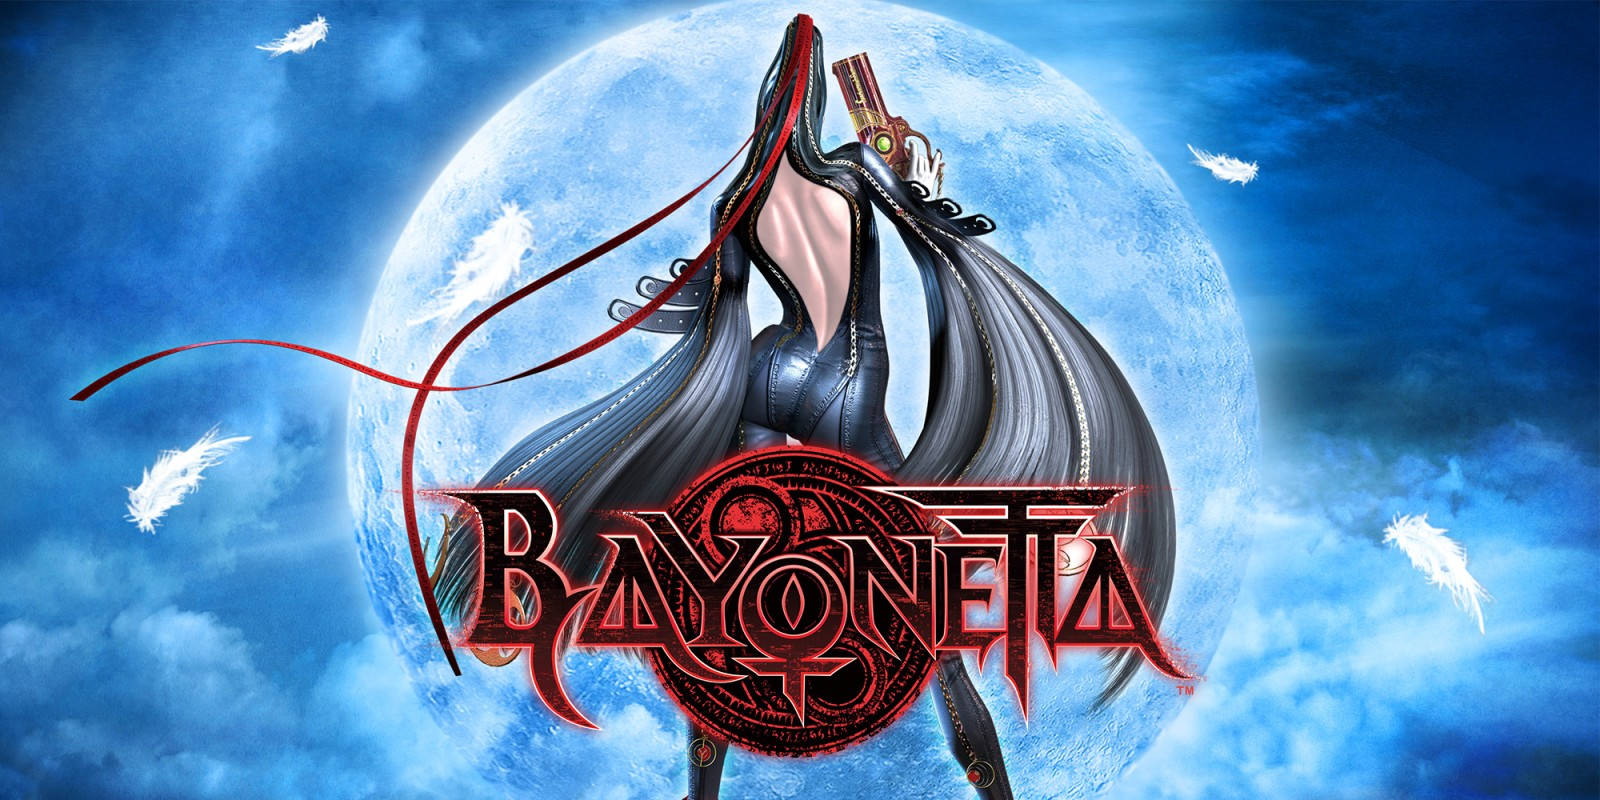 H2x1_NSwitch_Bayonetta1_image1600w Animal Crossing Switch